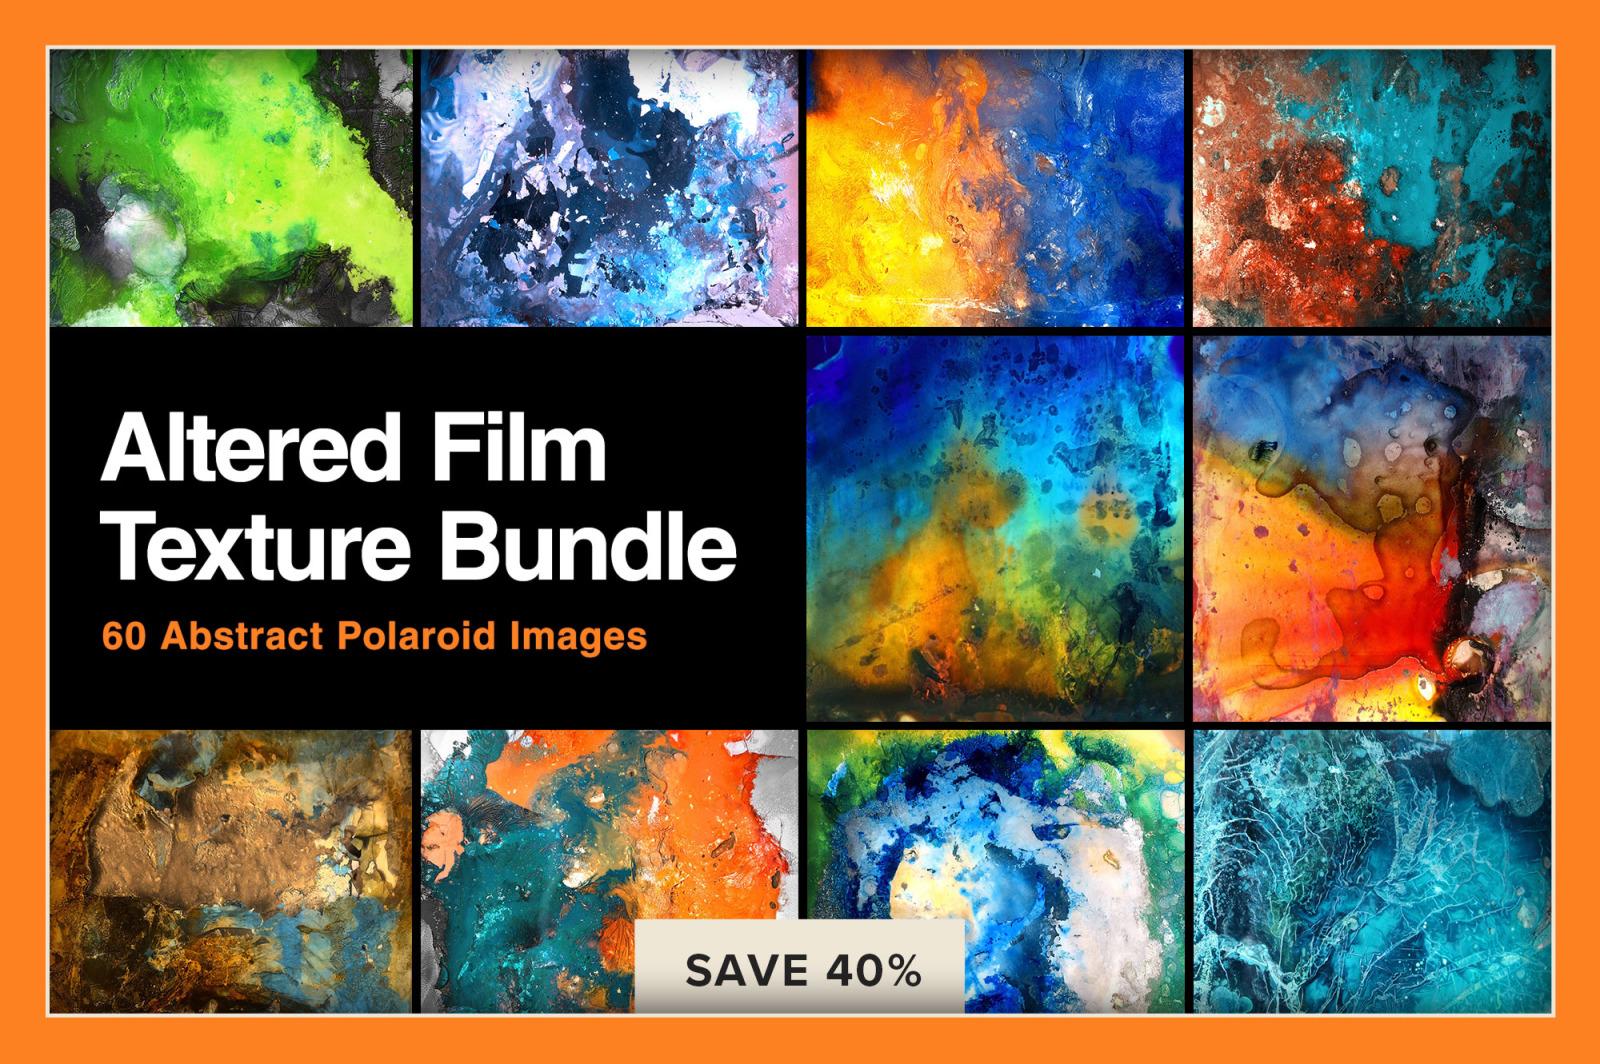 Altered Film Texture Bundle